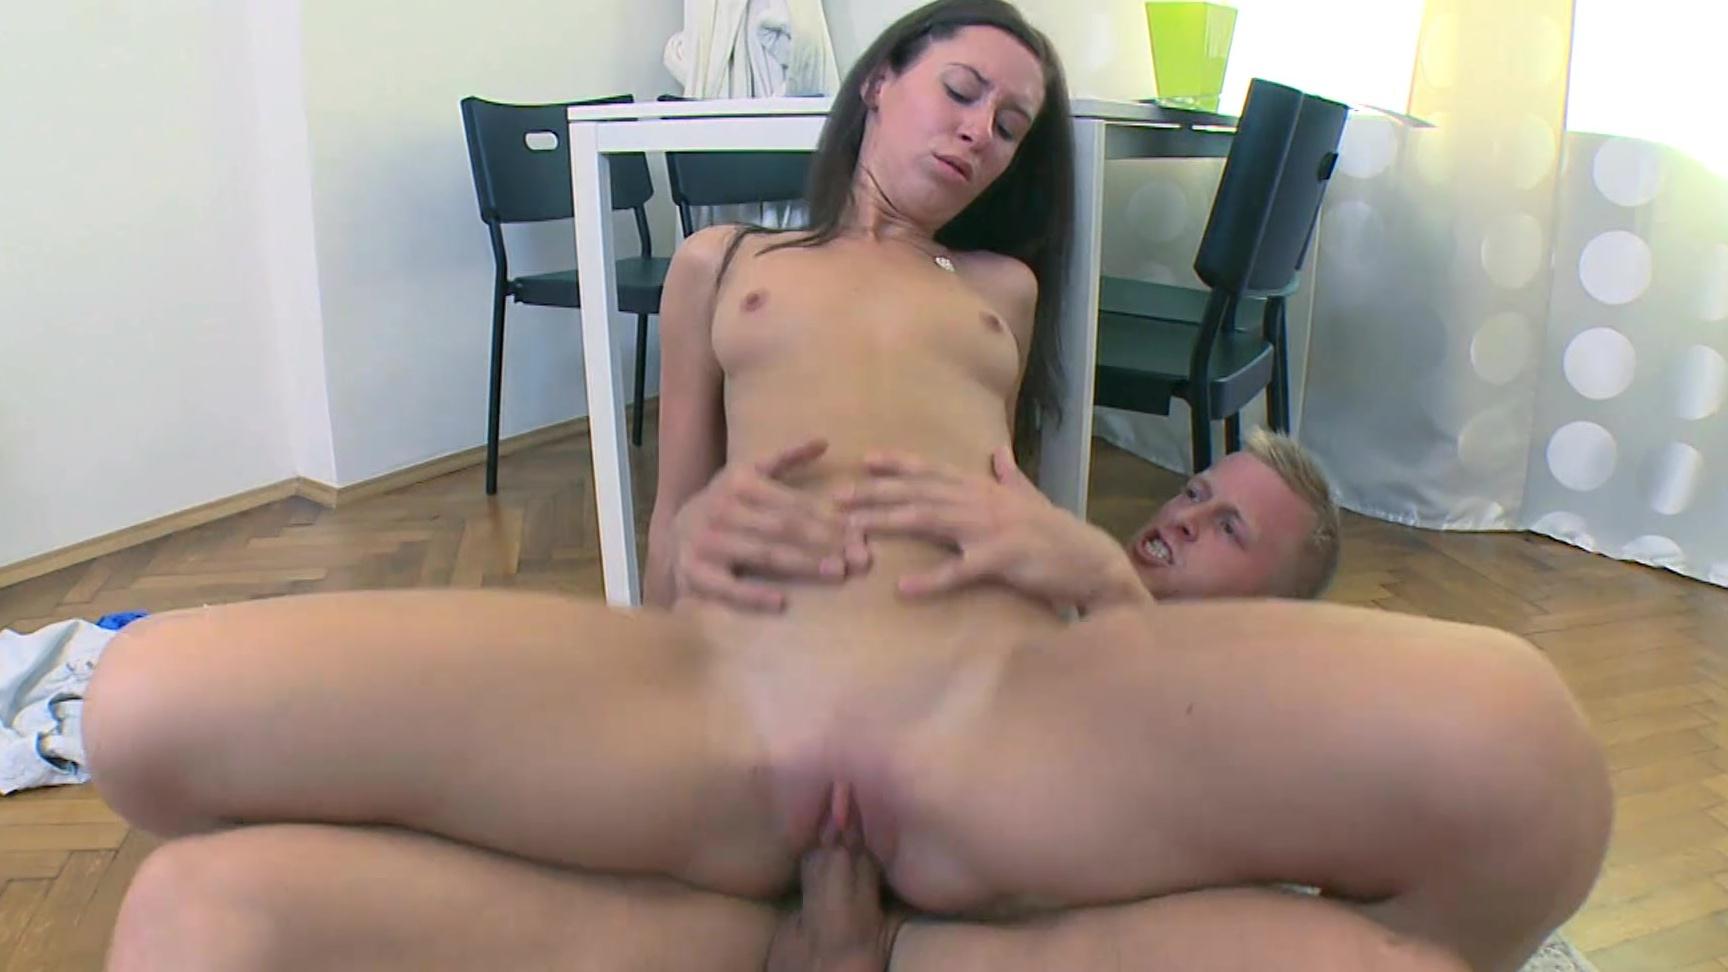 Hot lesbians with vibrators